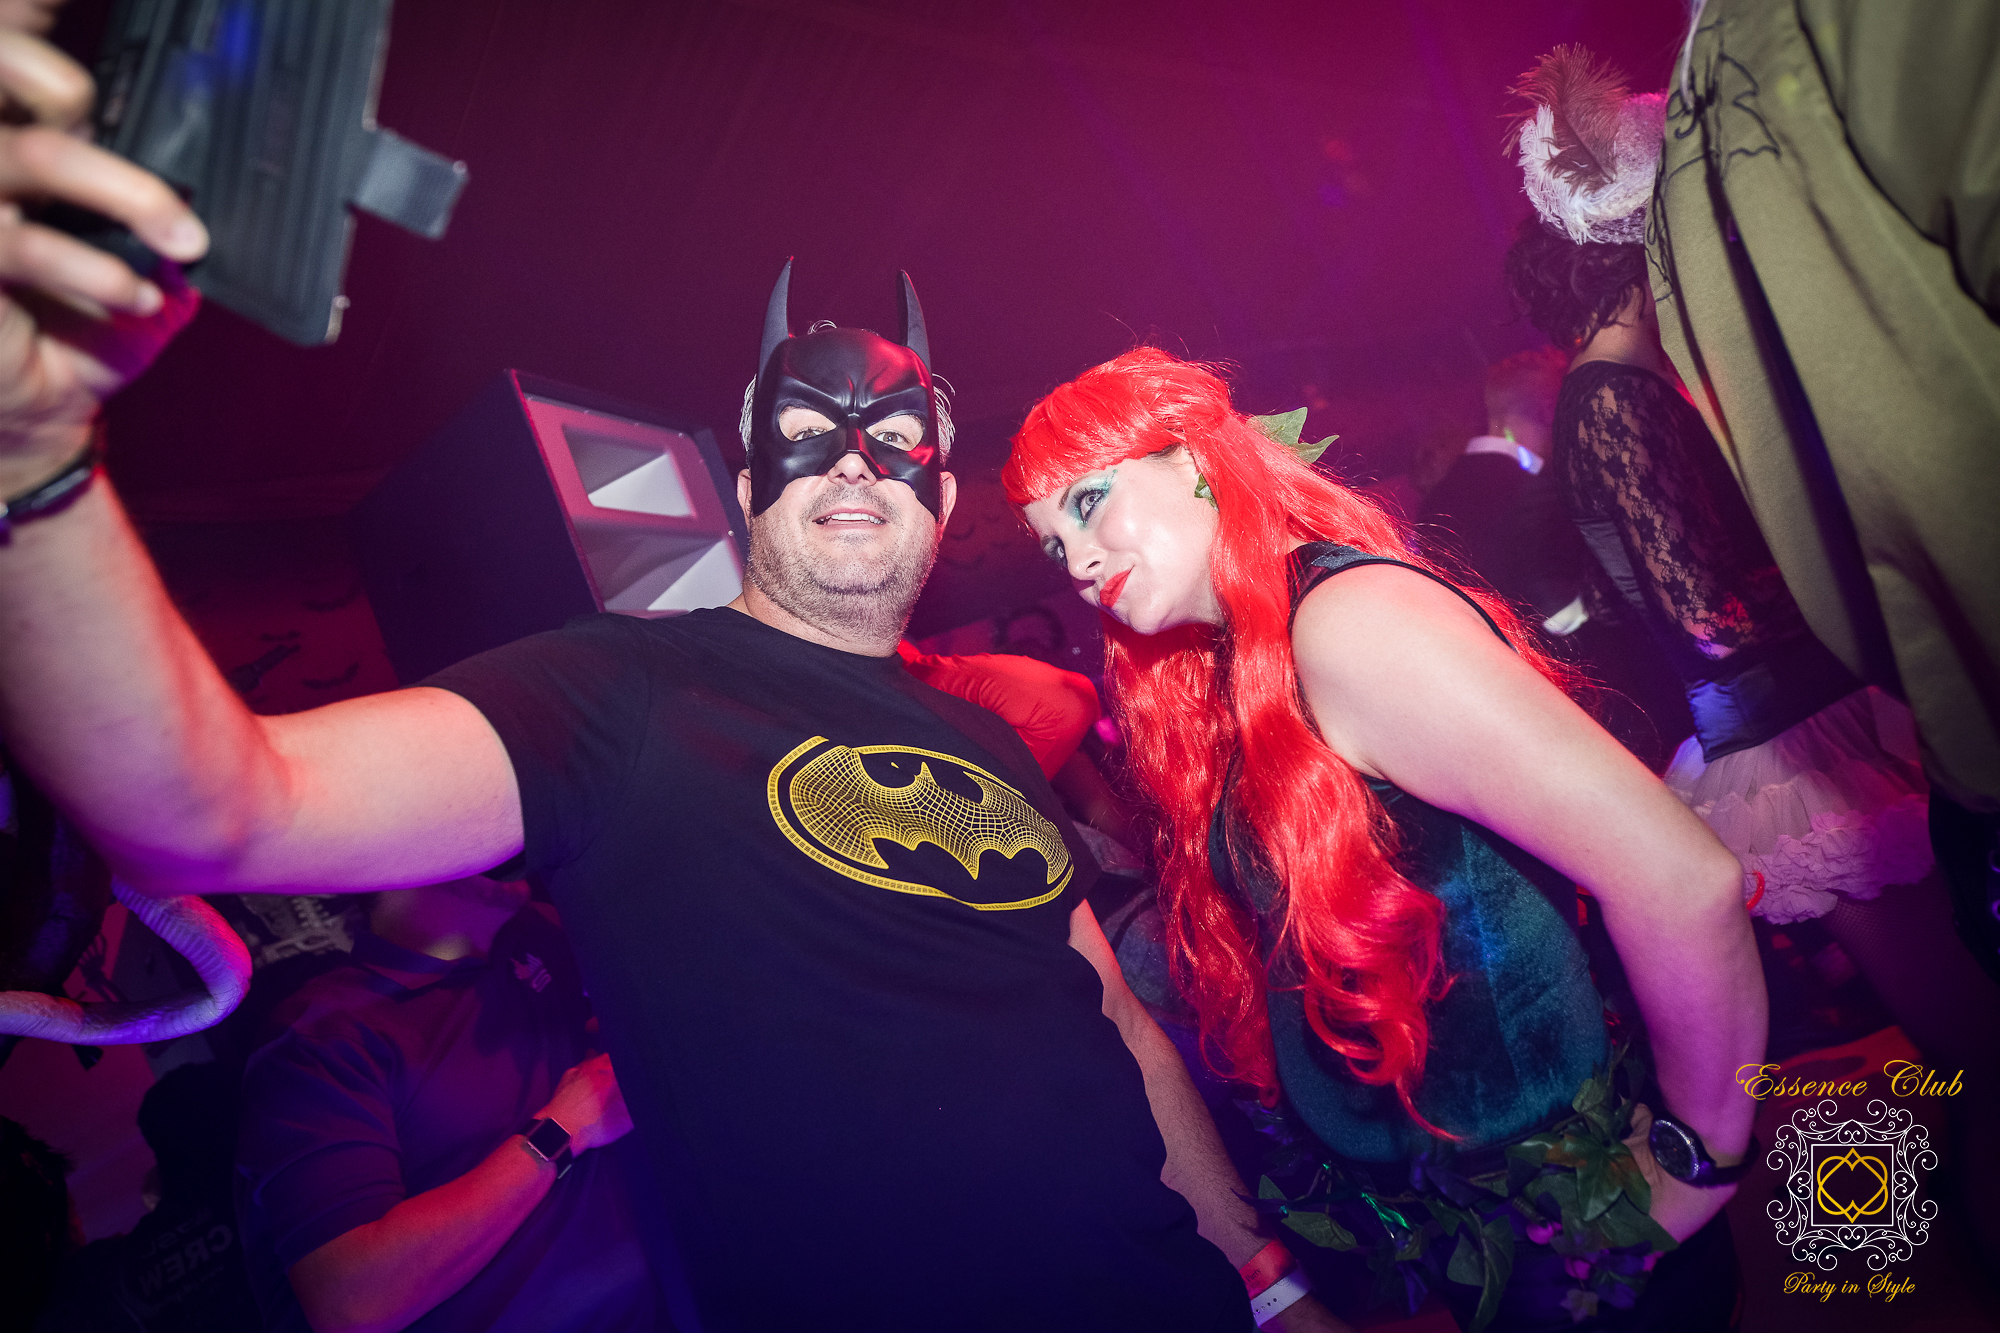 Essence club heaven hell and batman